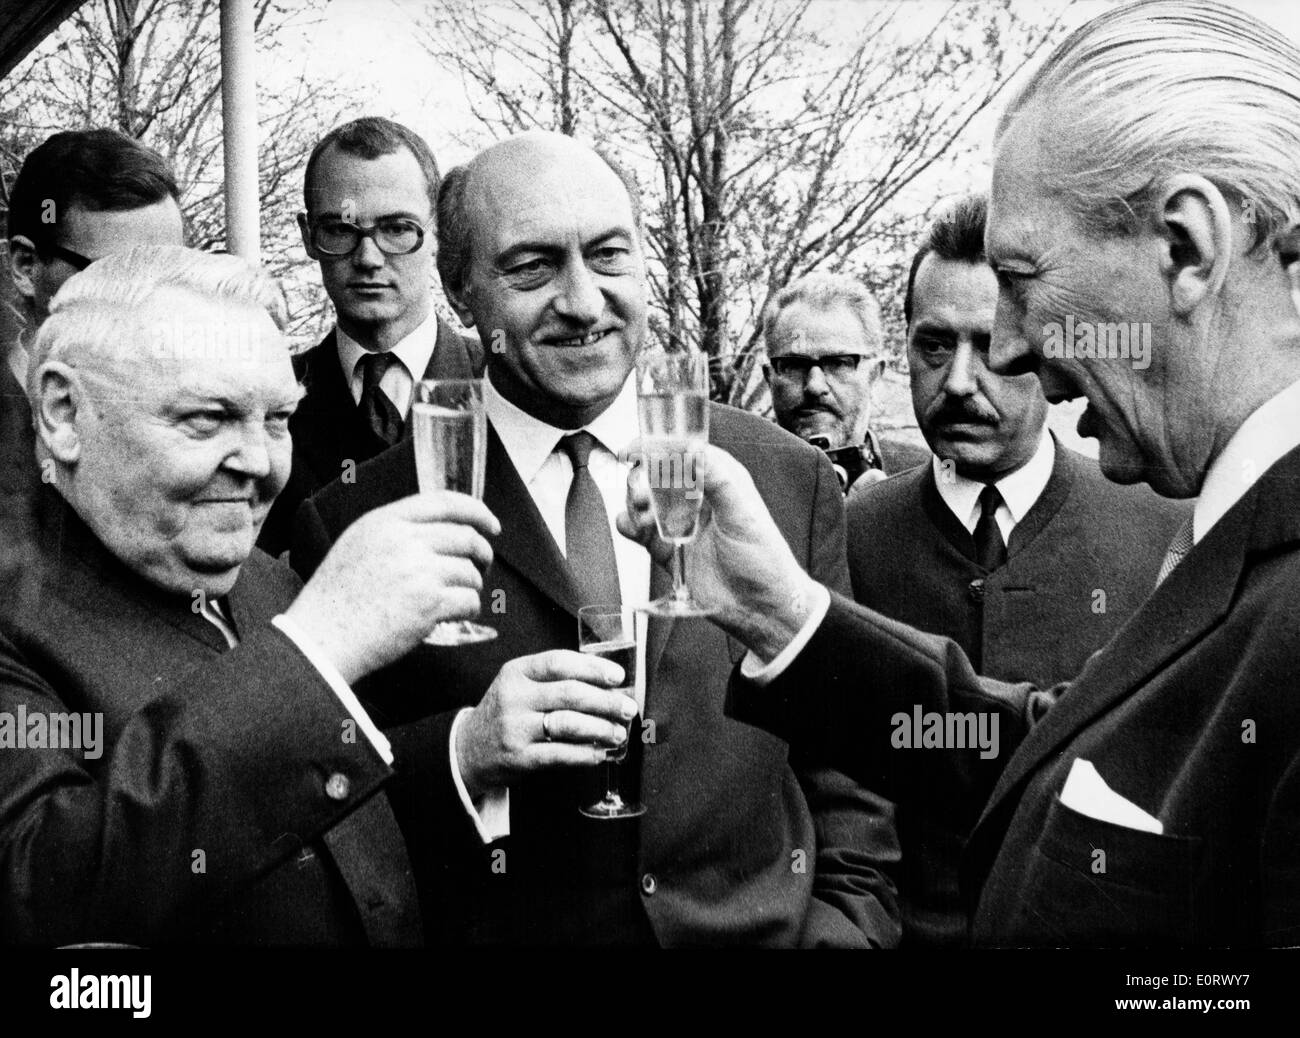 Ludwig Erhard toasting with others - Stock Image